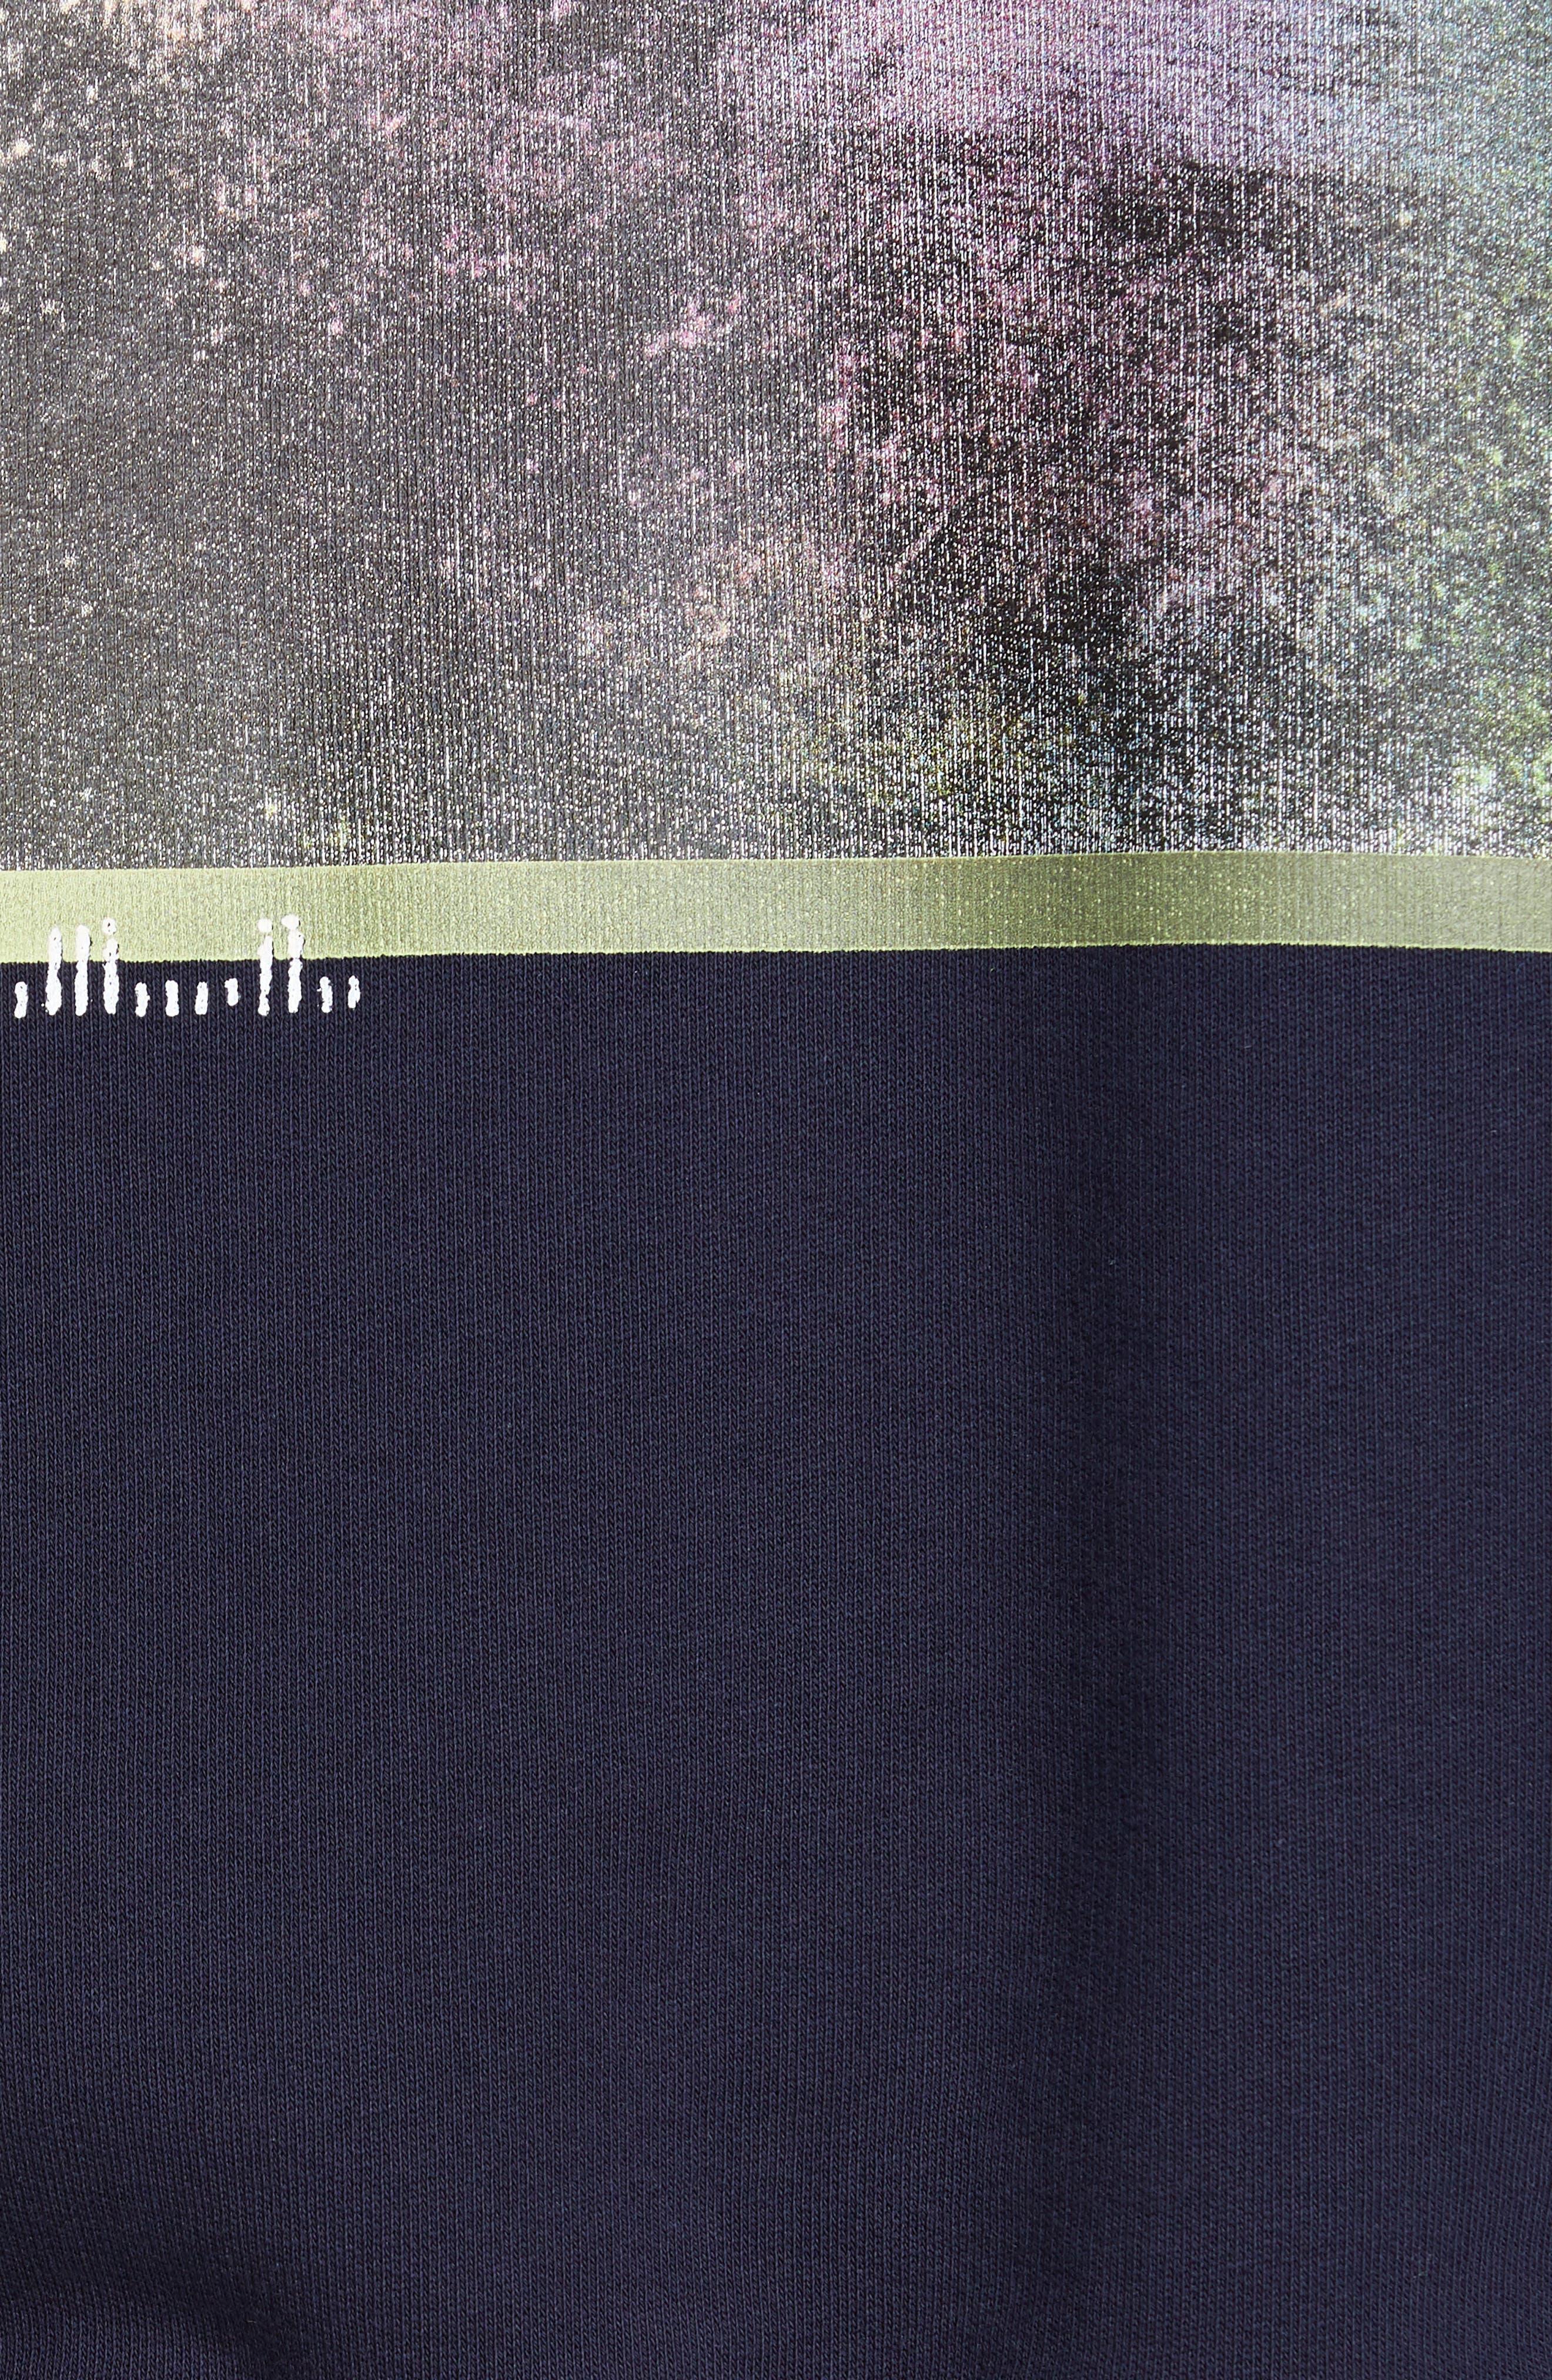 ACNE STUDIOS, Forba Sweden Graphic Sweatshirt, Alternate thumbnail 5, color, NAVY